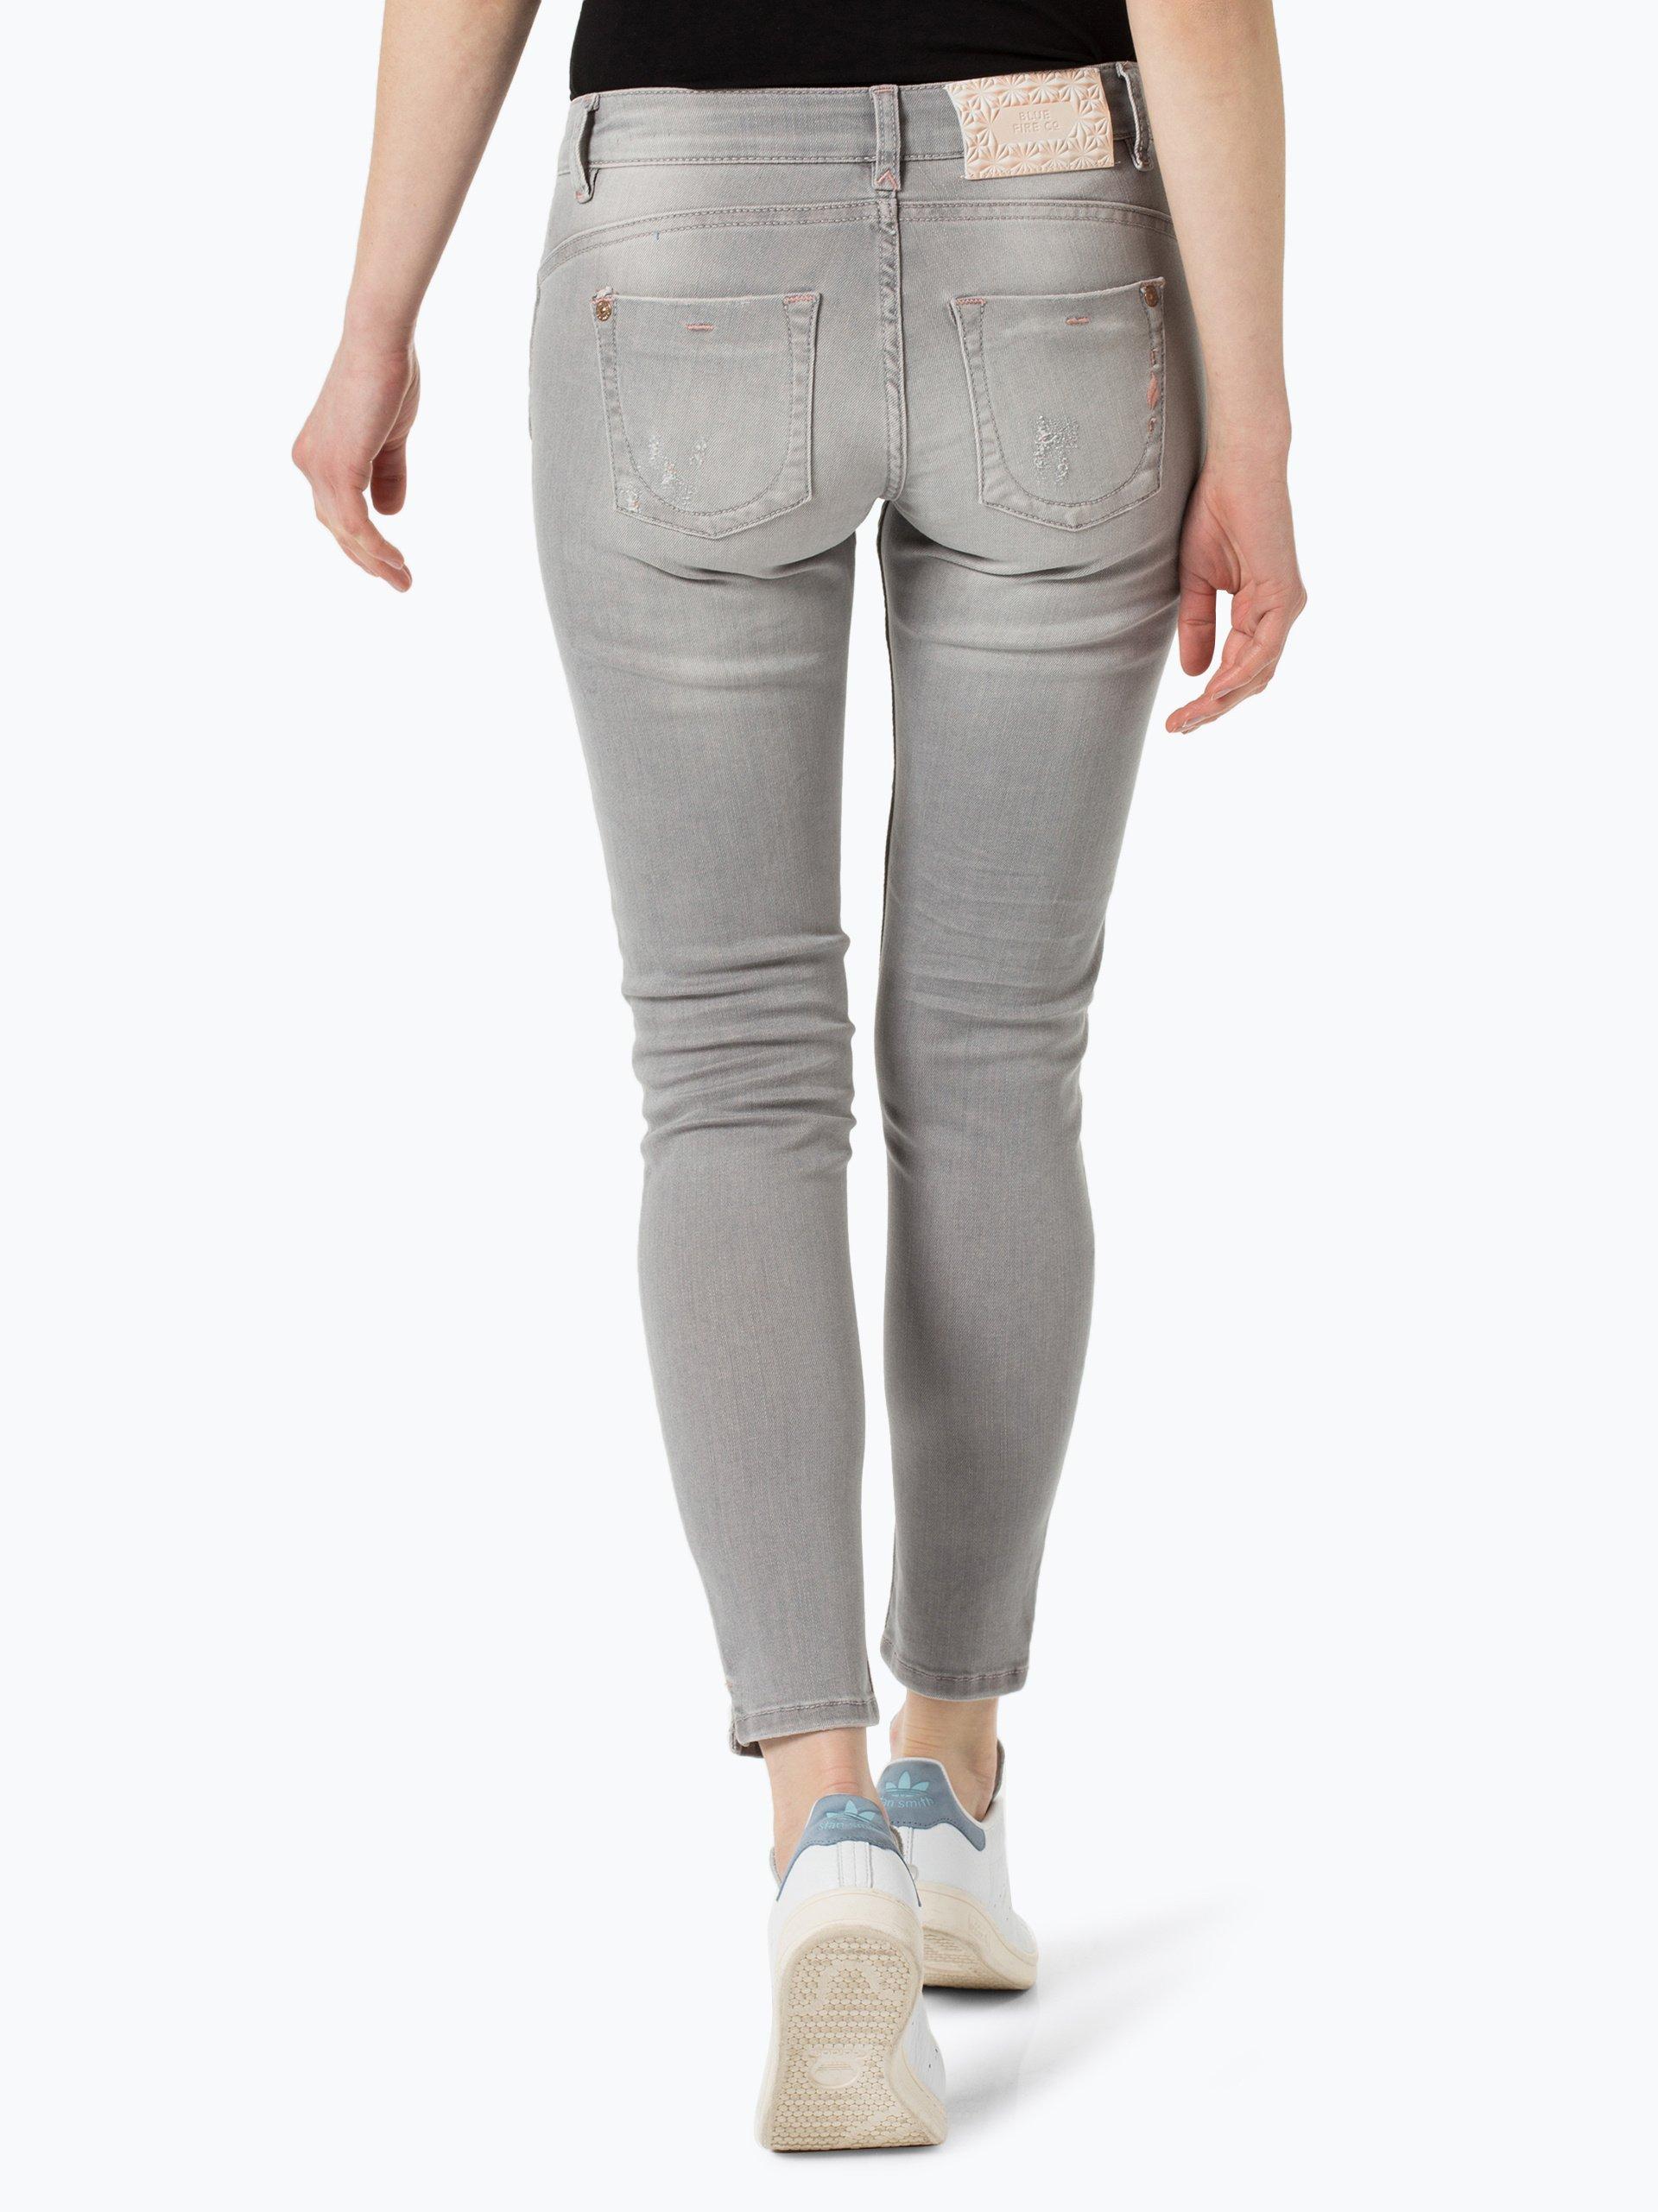 blue fire damen jeans alicia silber grau uni online. Black Bedroom Furniture Sets. Home Design Ideas